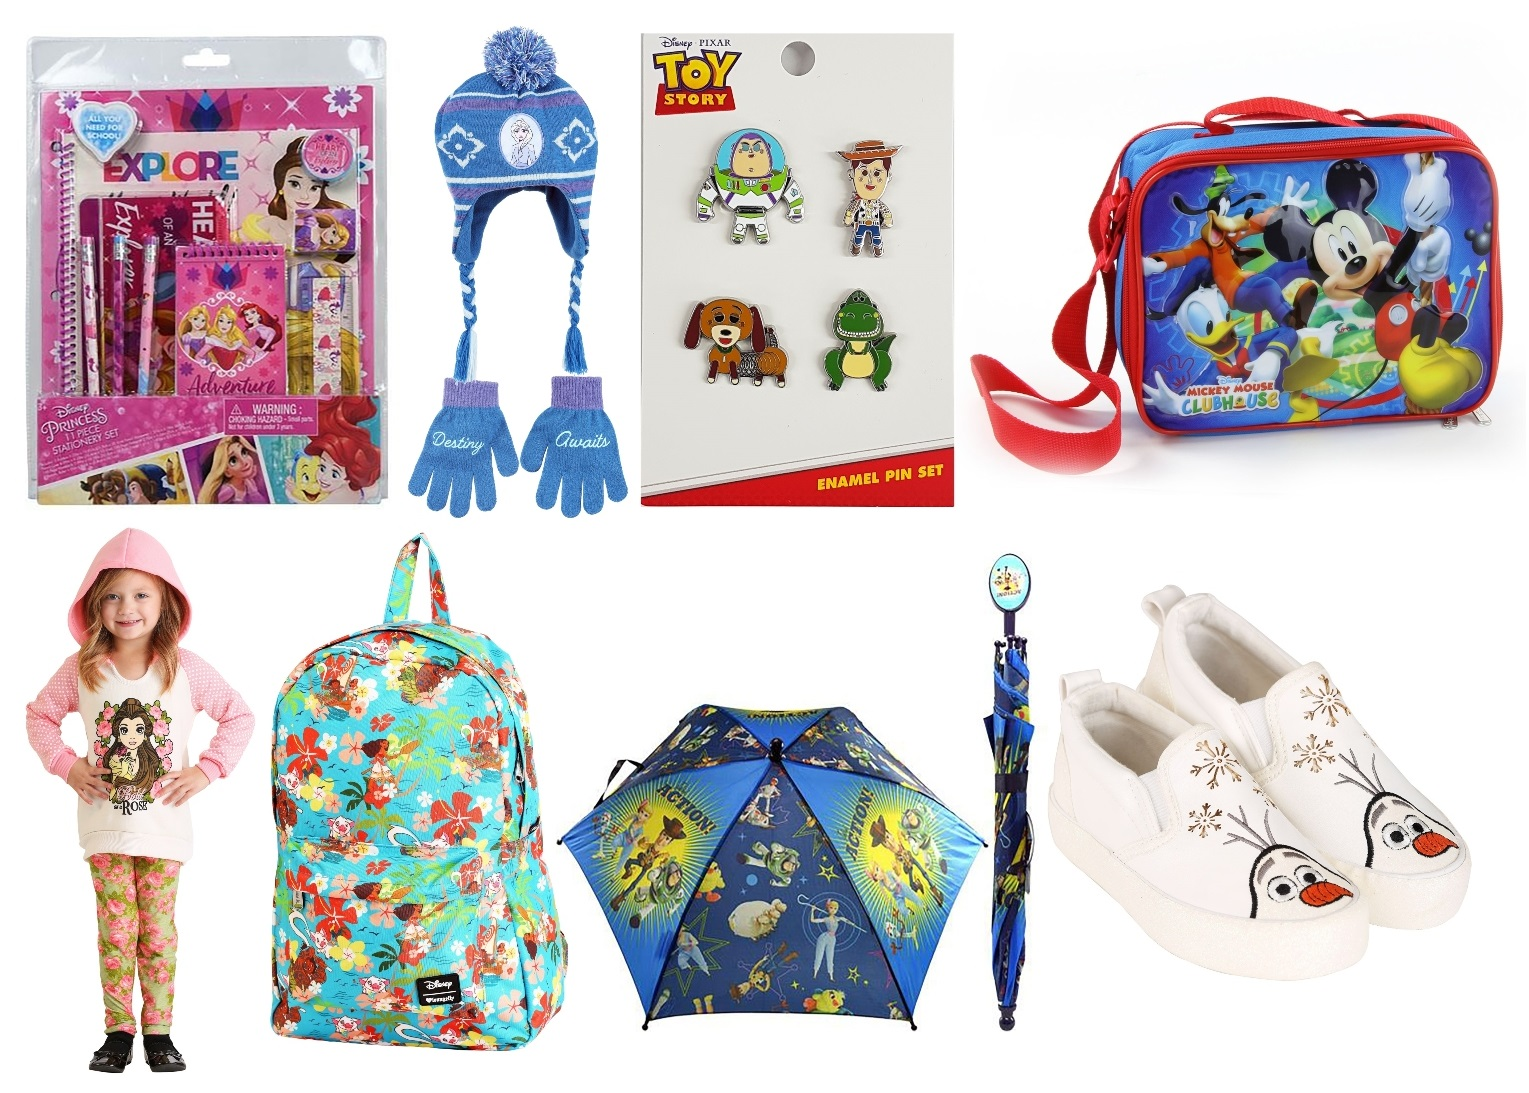 Disney Gifts for School